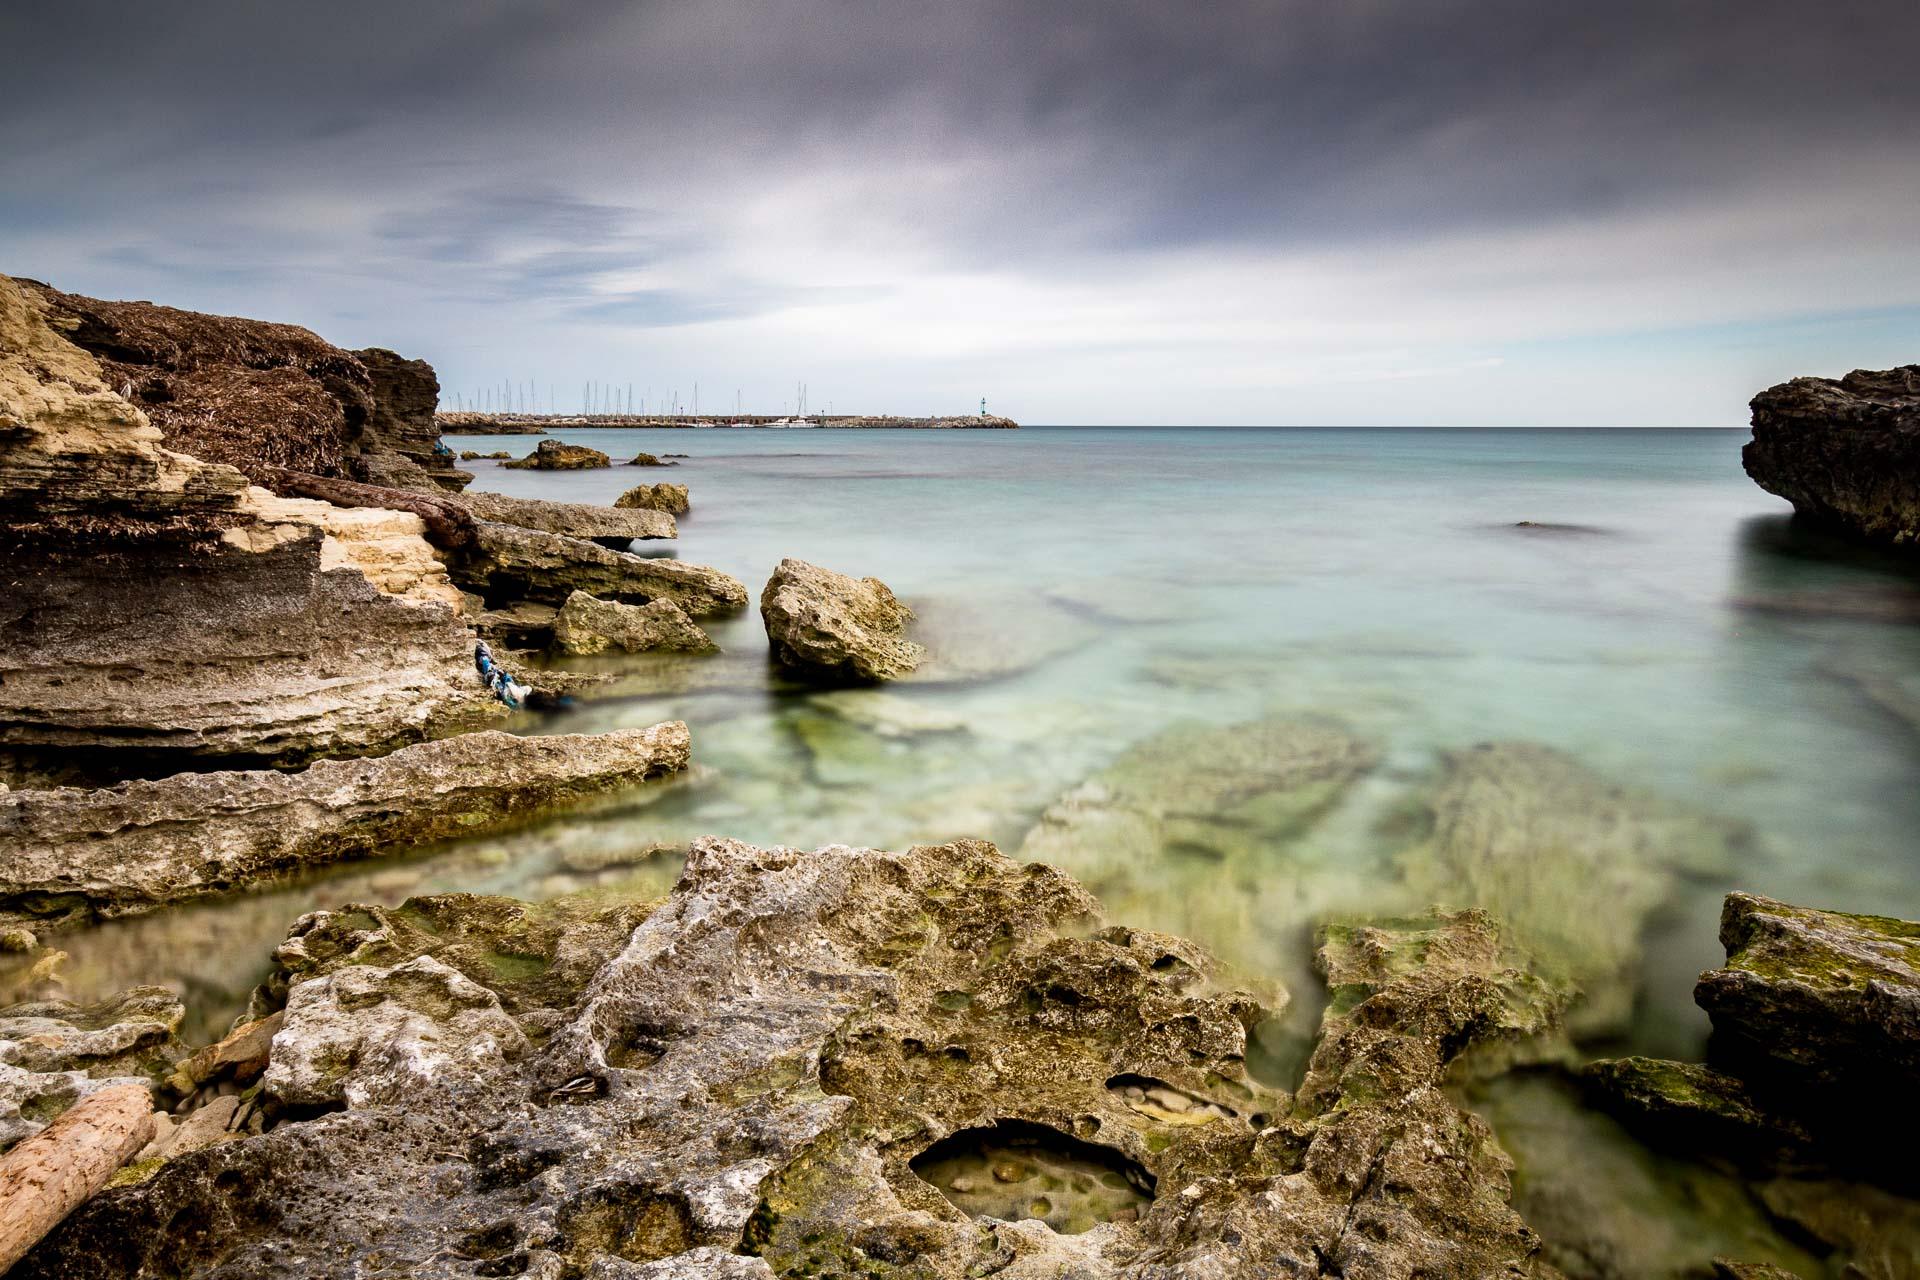 San Foca, seascape long exposure photography